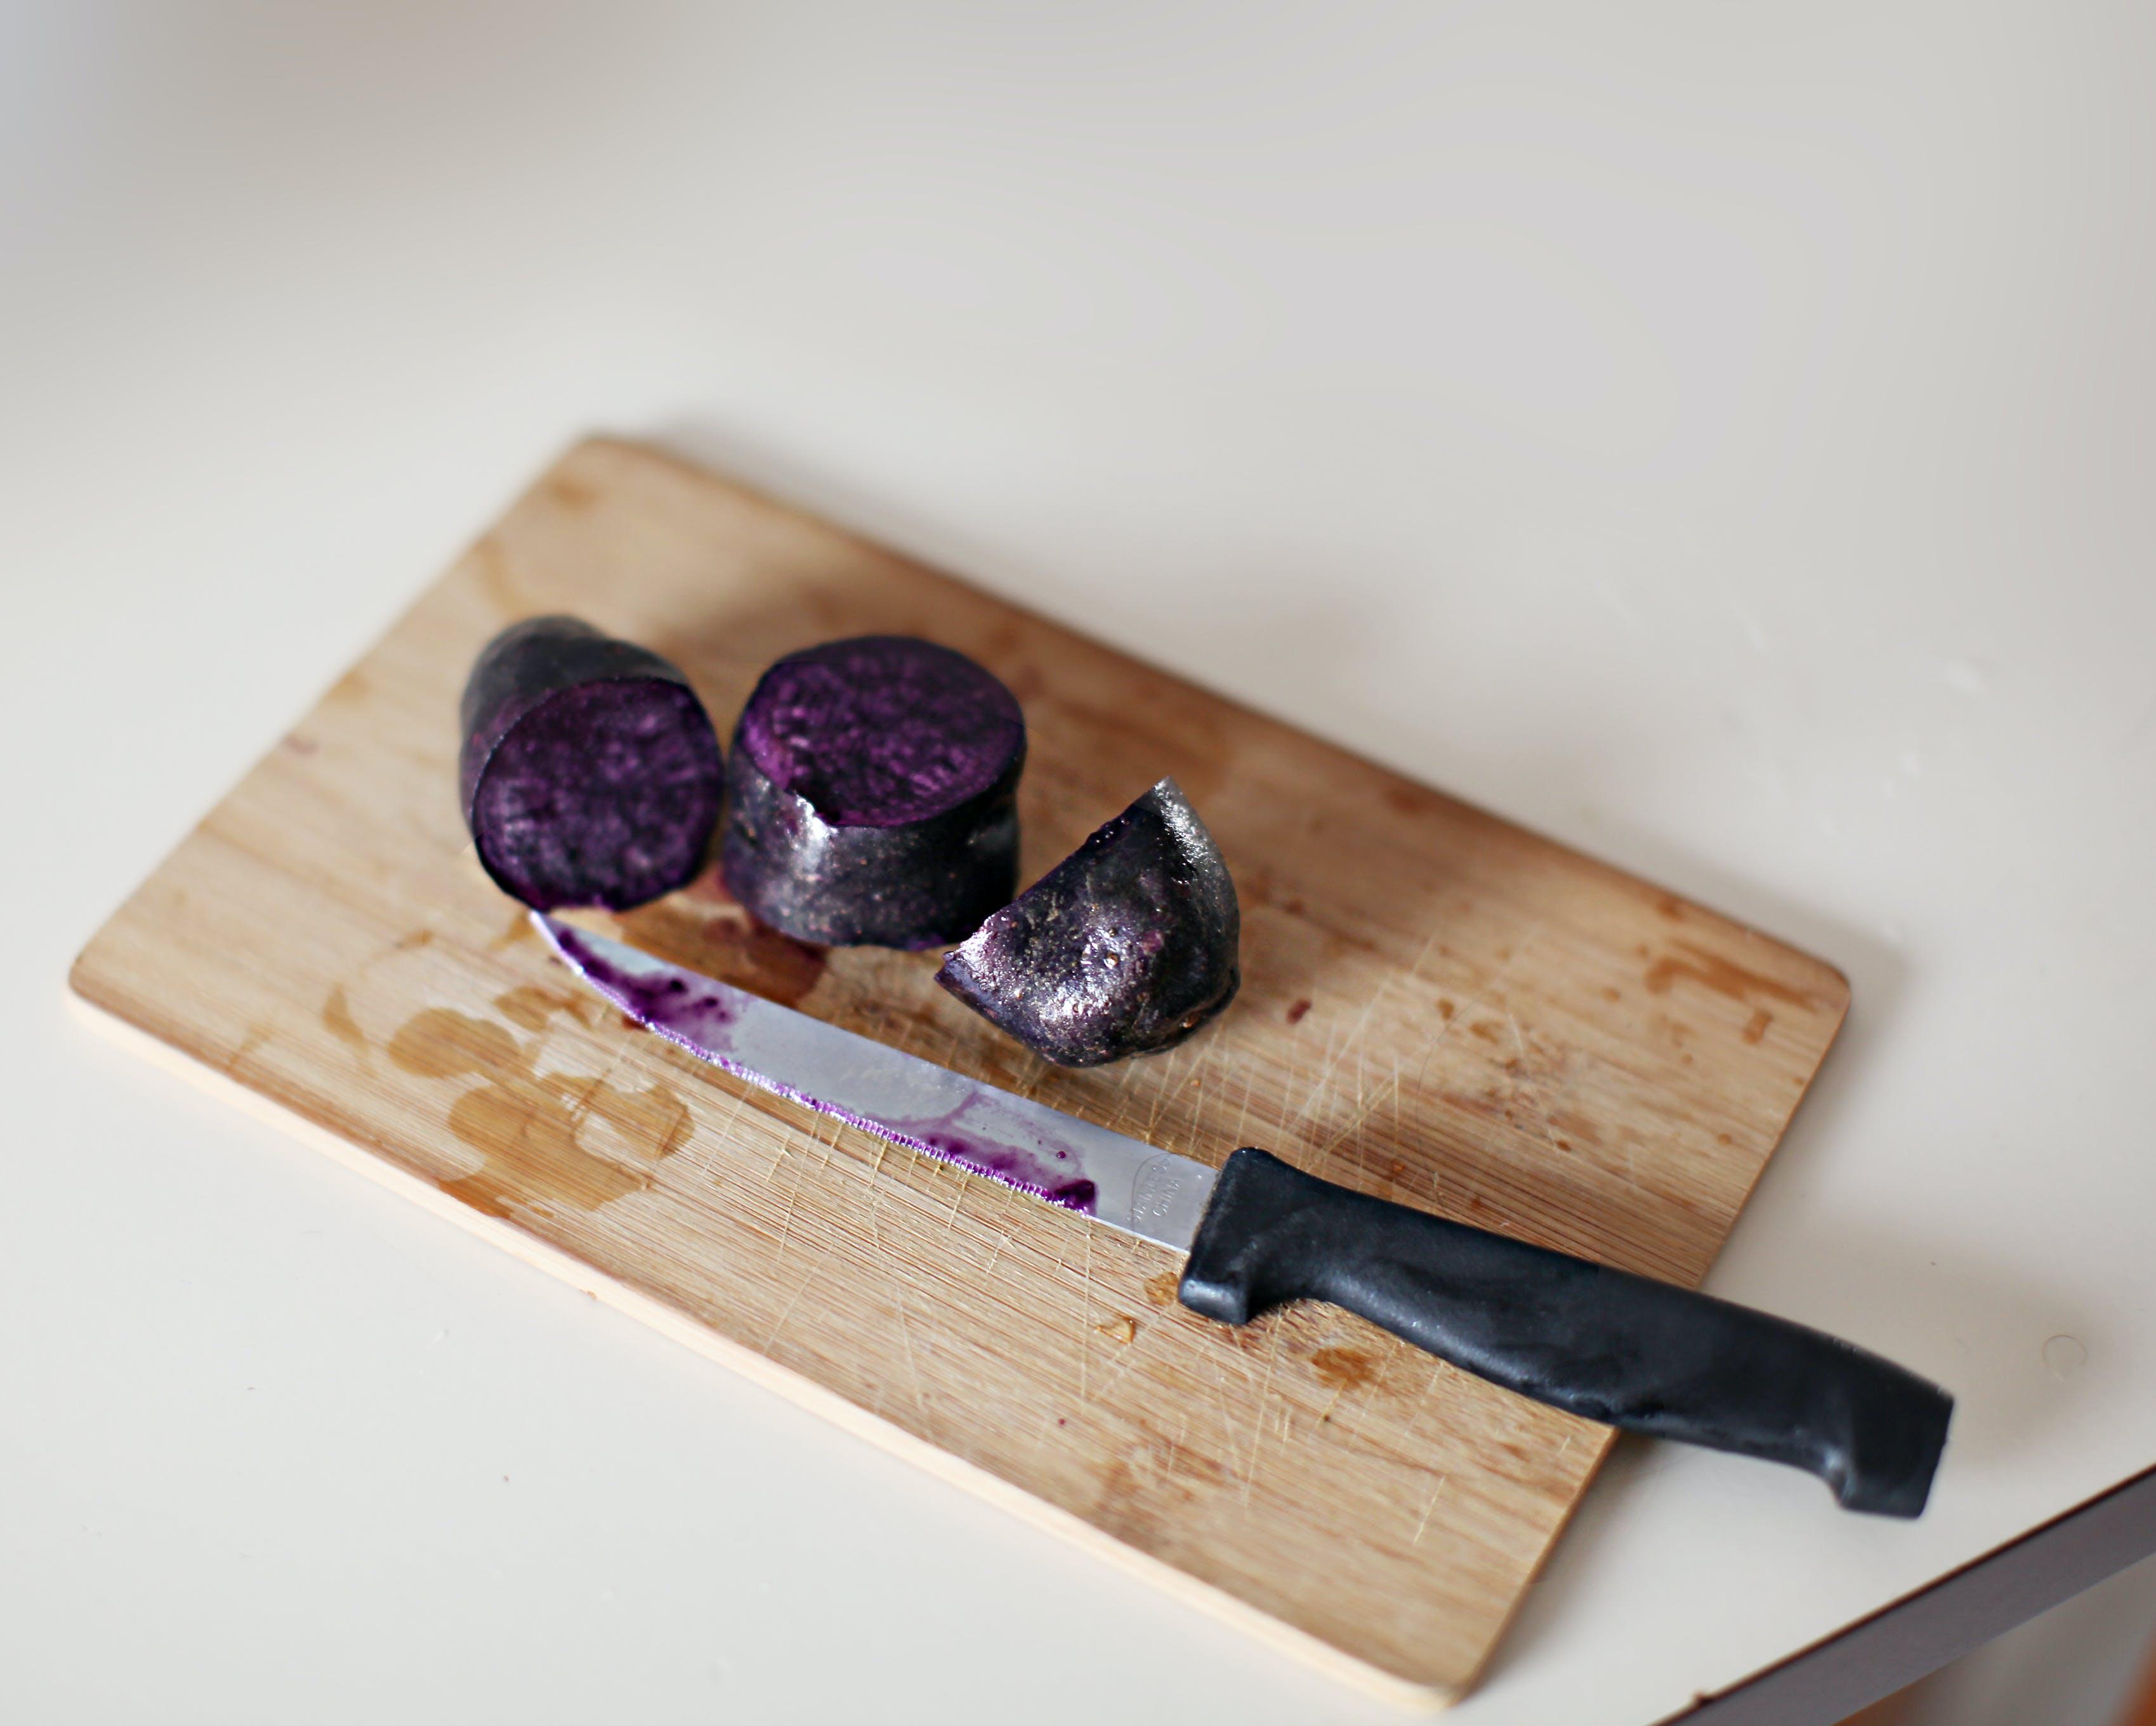 Gratis lagerfoto af klippe, madlavning knive, violaceae